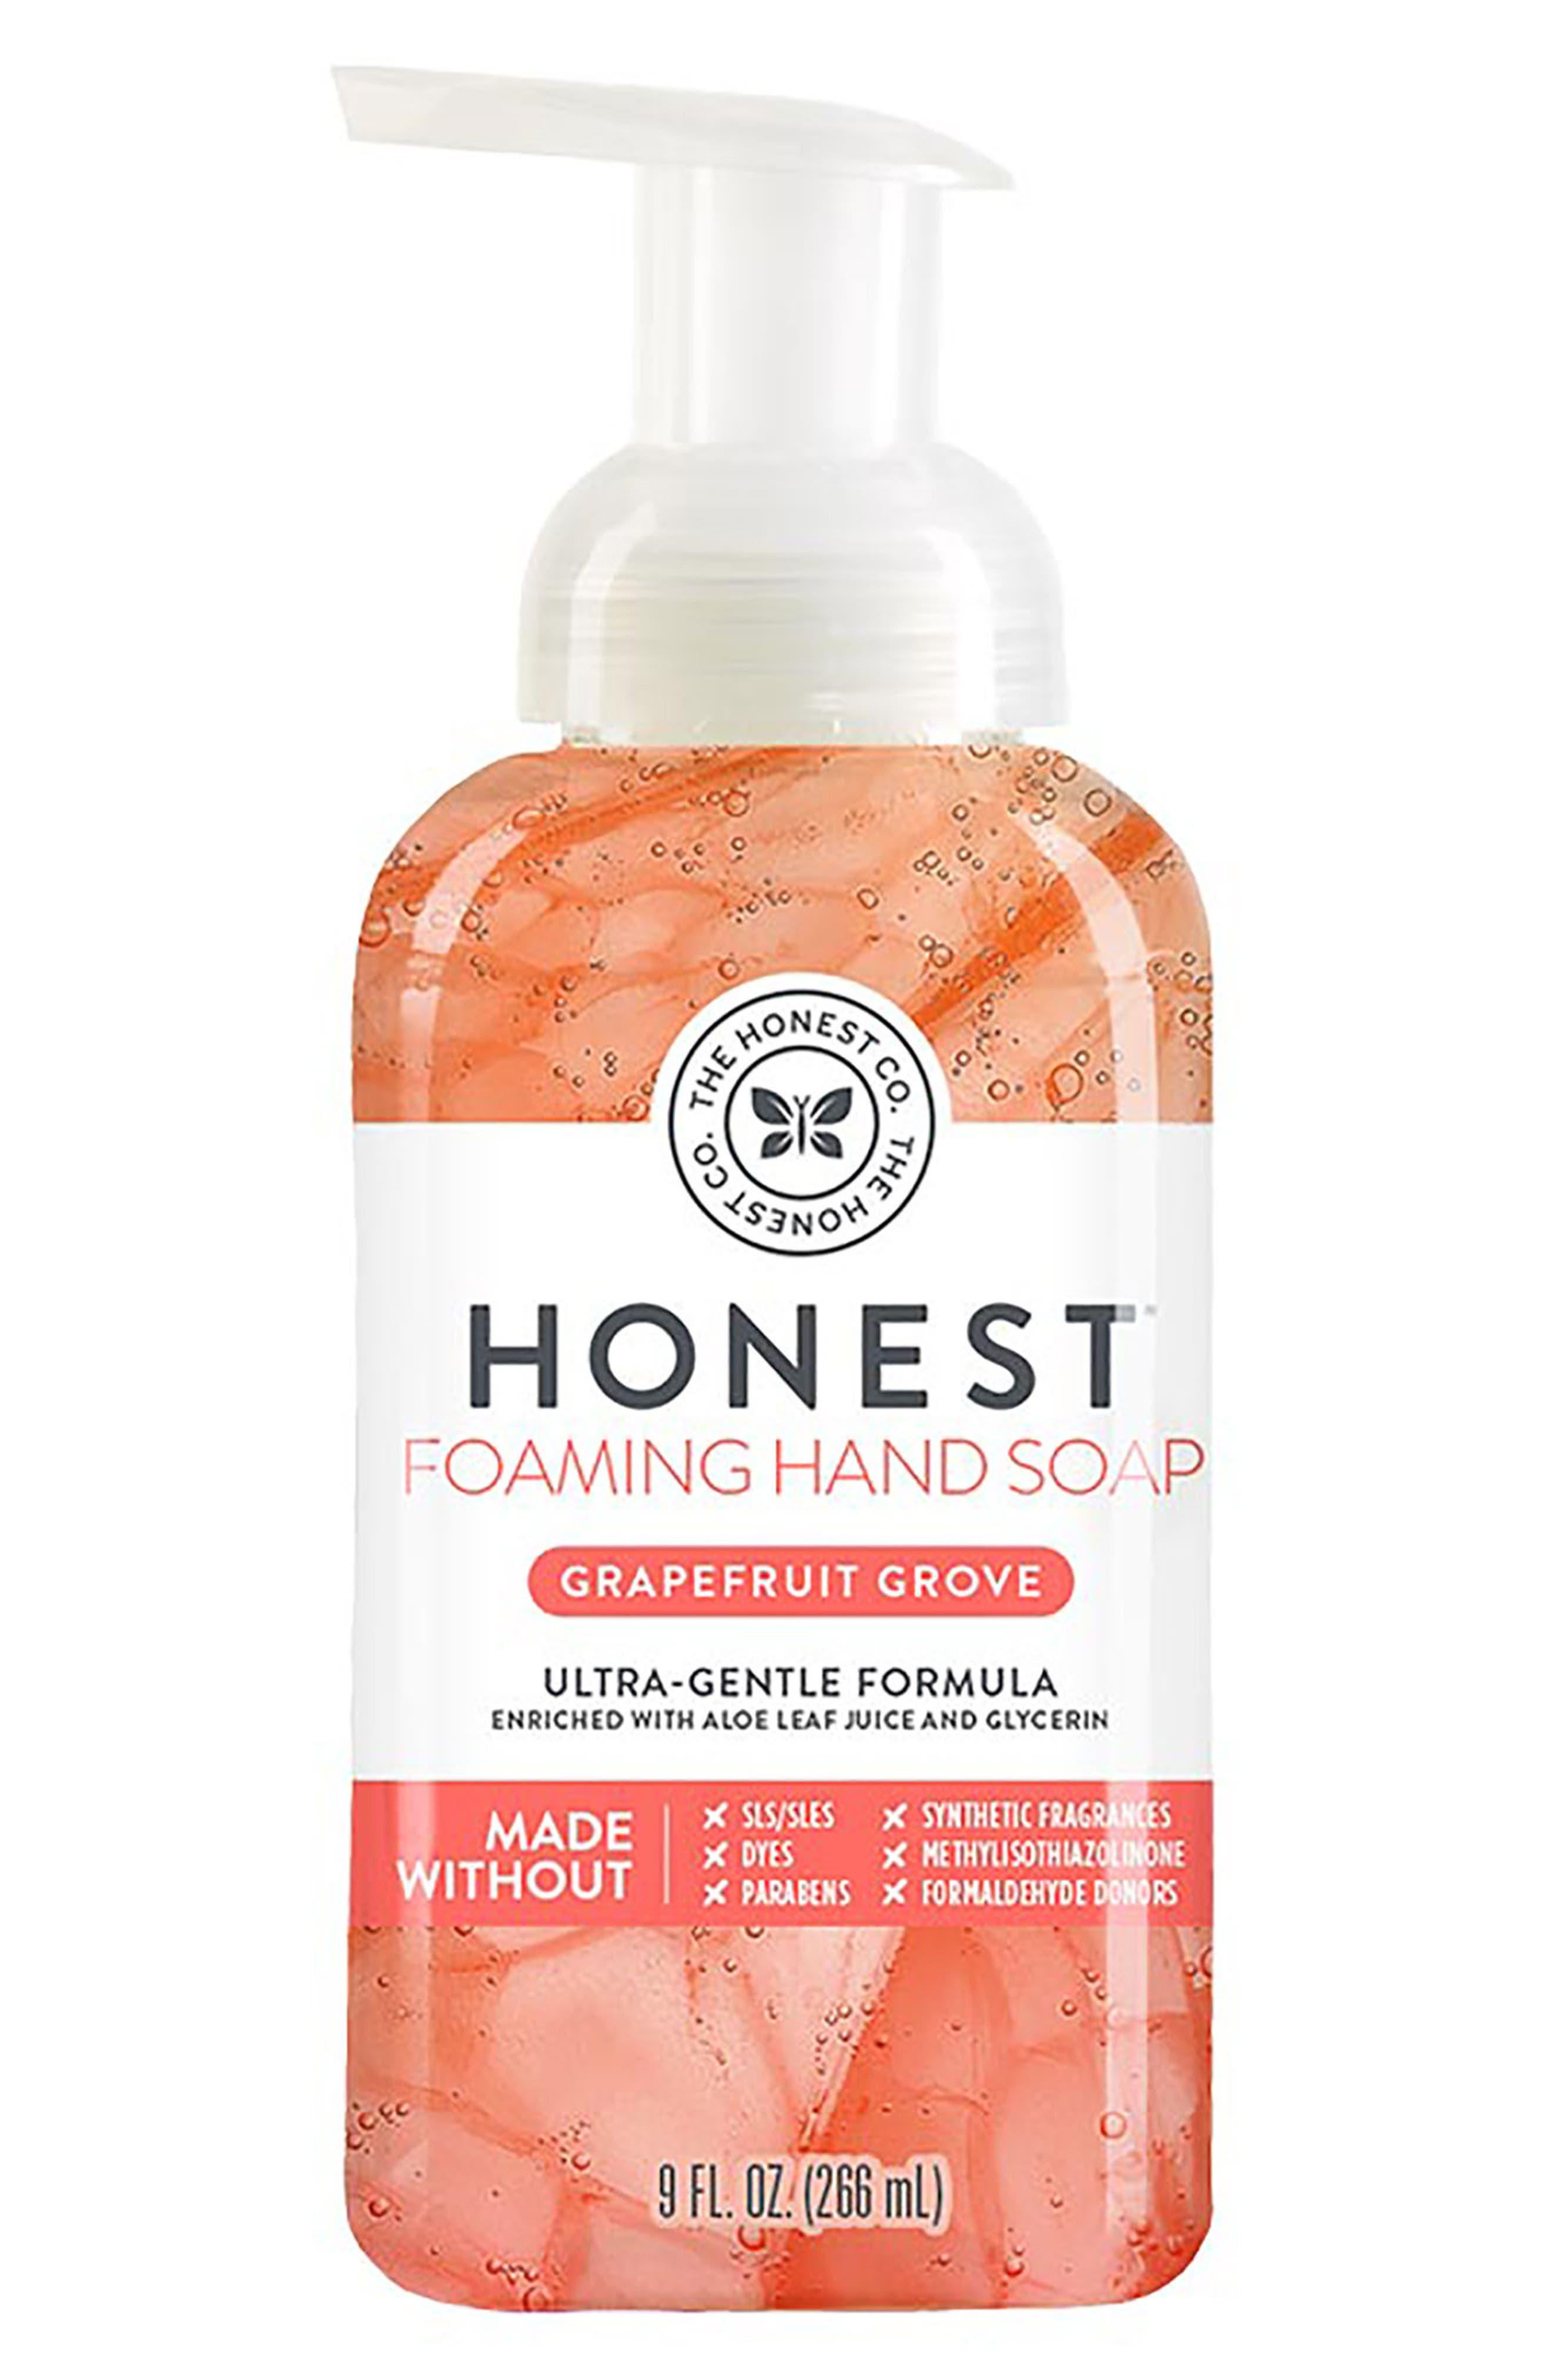 Alternate Image 1 Selected - The Honest Company Grapefruit Grove Foaming Hand Soap